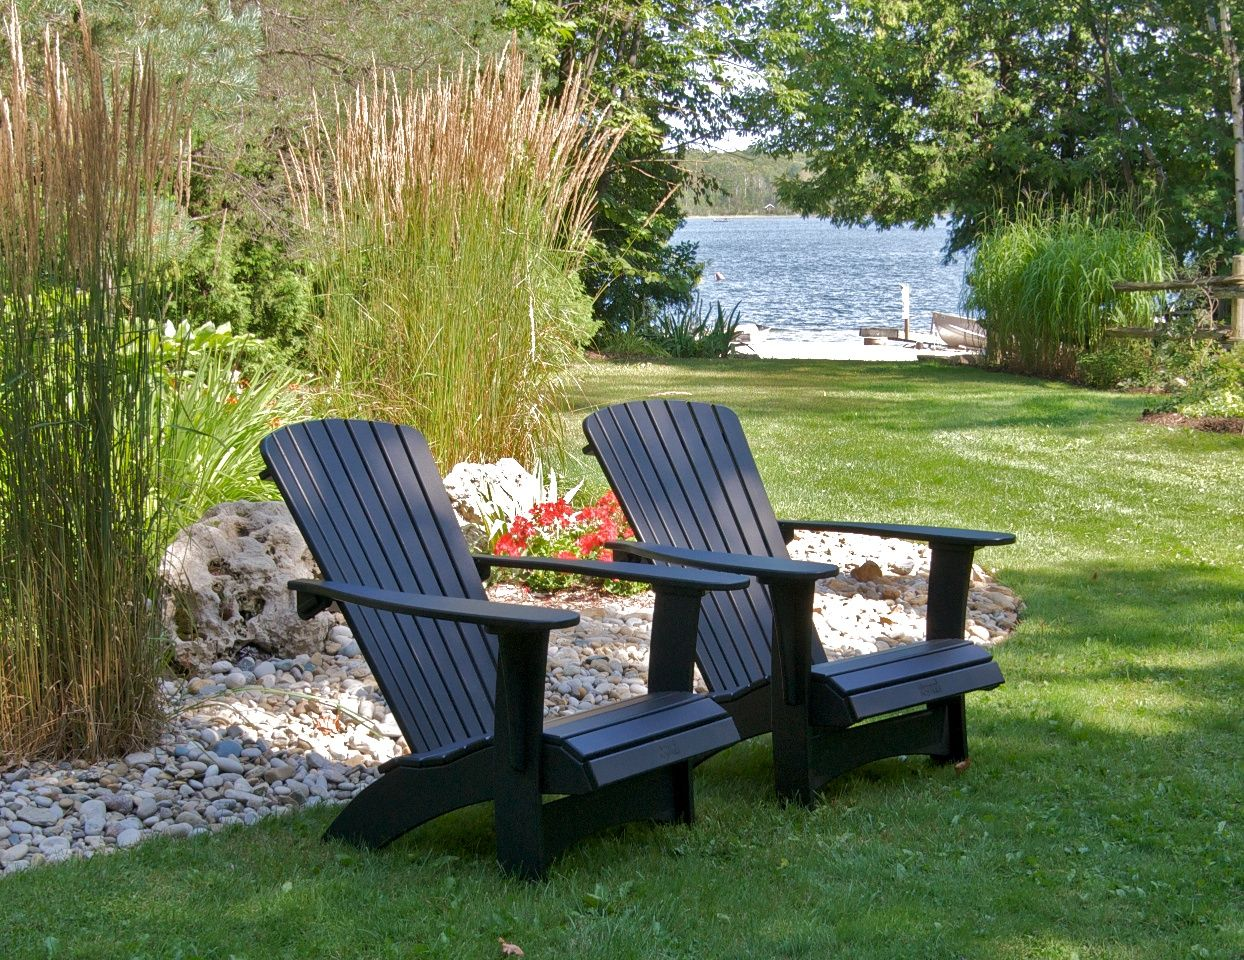 Maintenance free #Muskoka chairs in the garden! Midnight Black ...